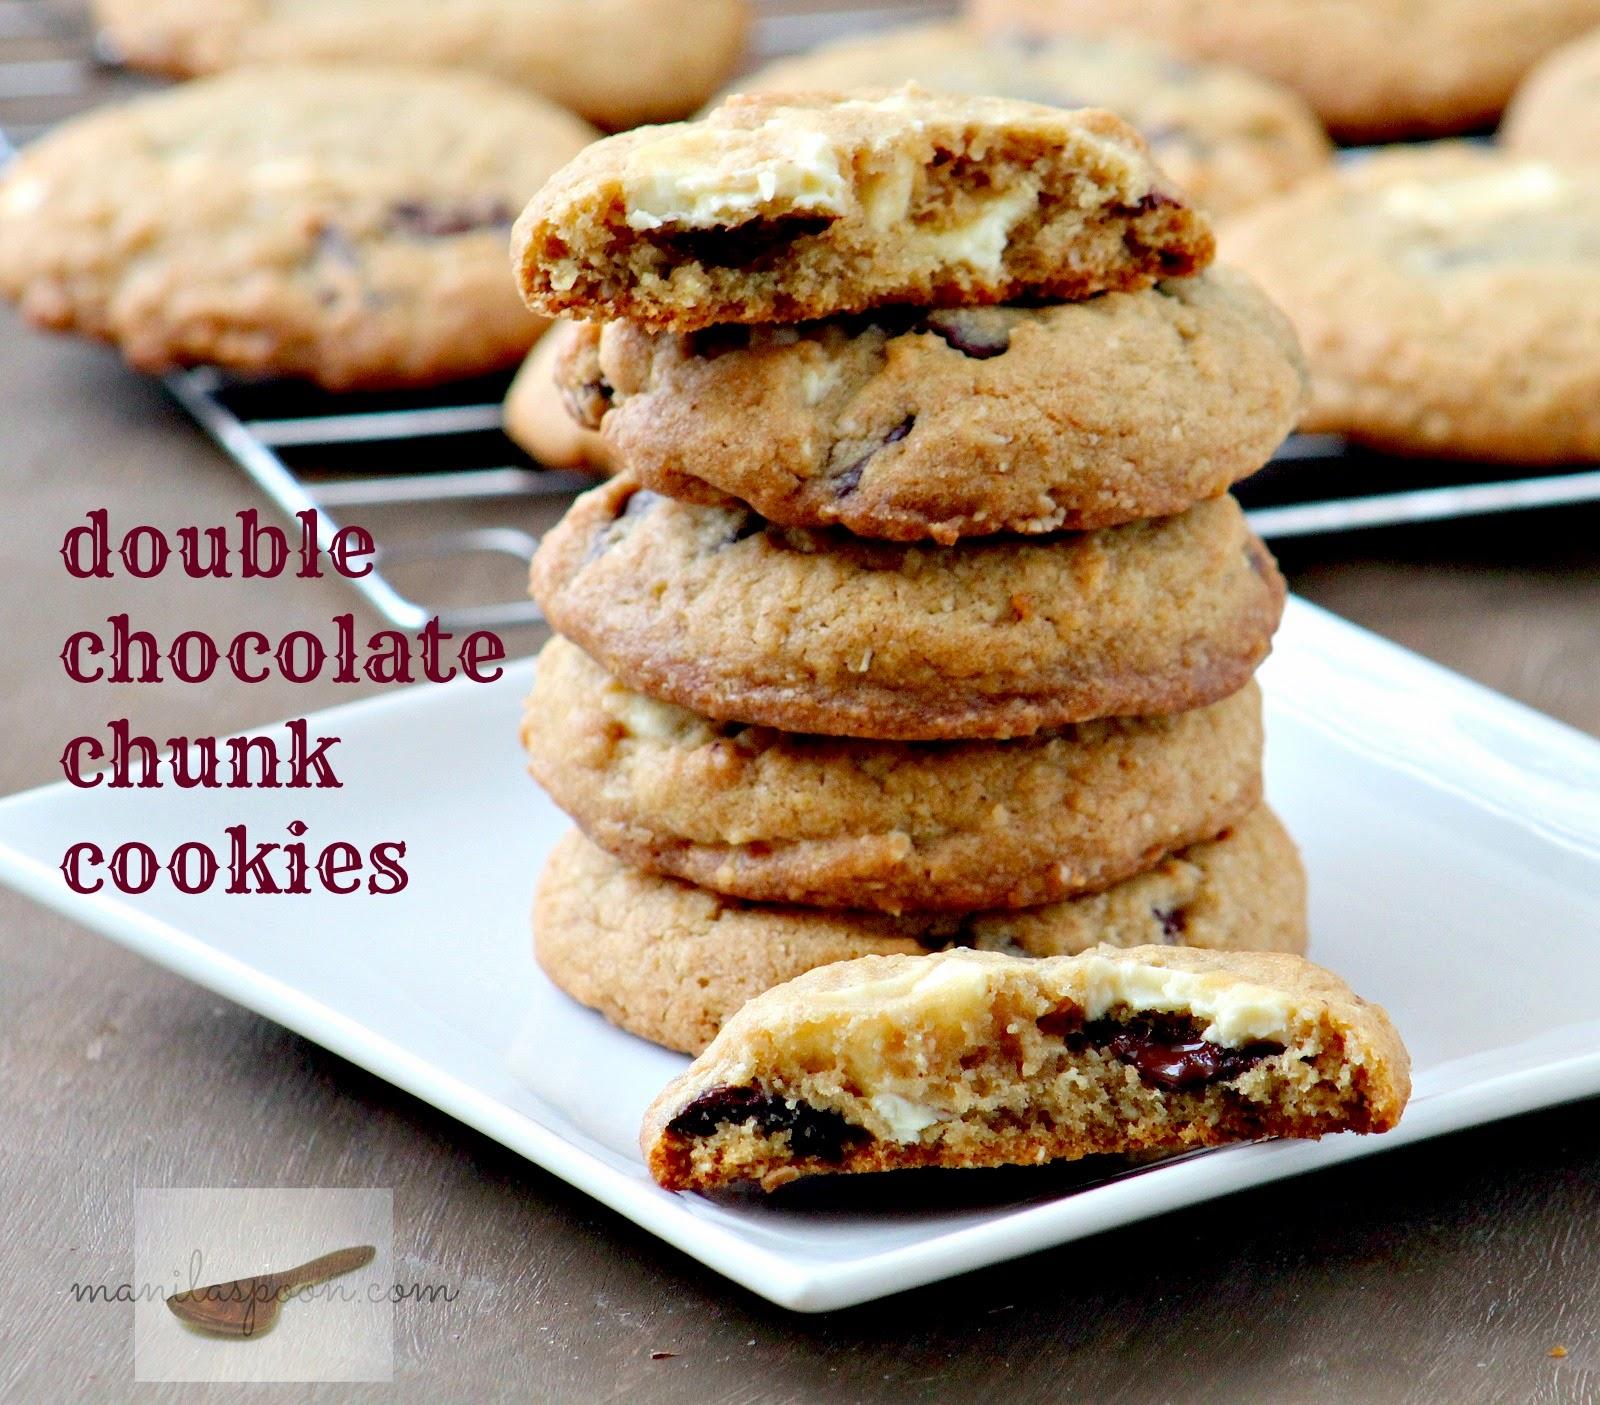 Double Chocolate Chunk Cookies | Manila Spoon